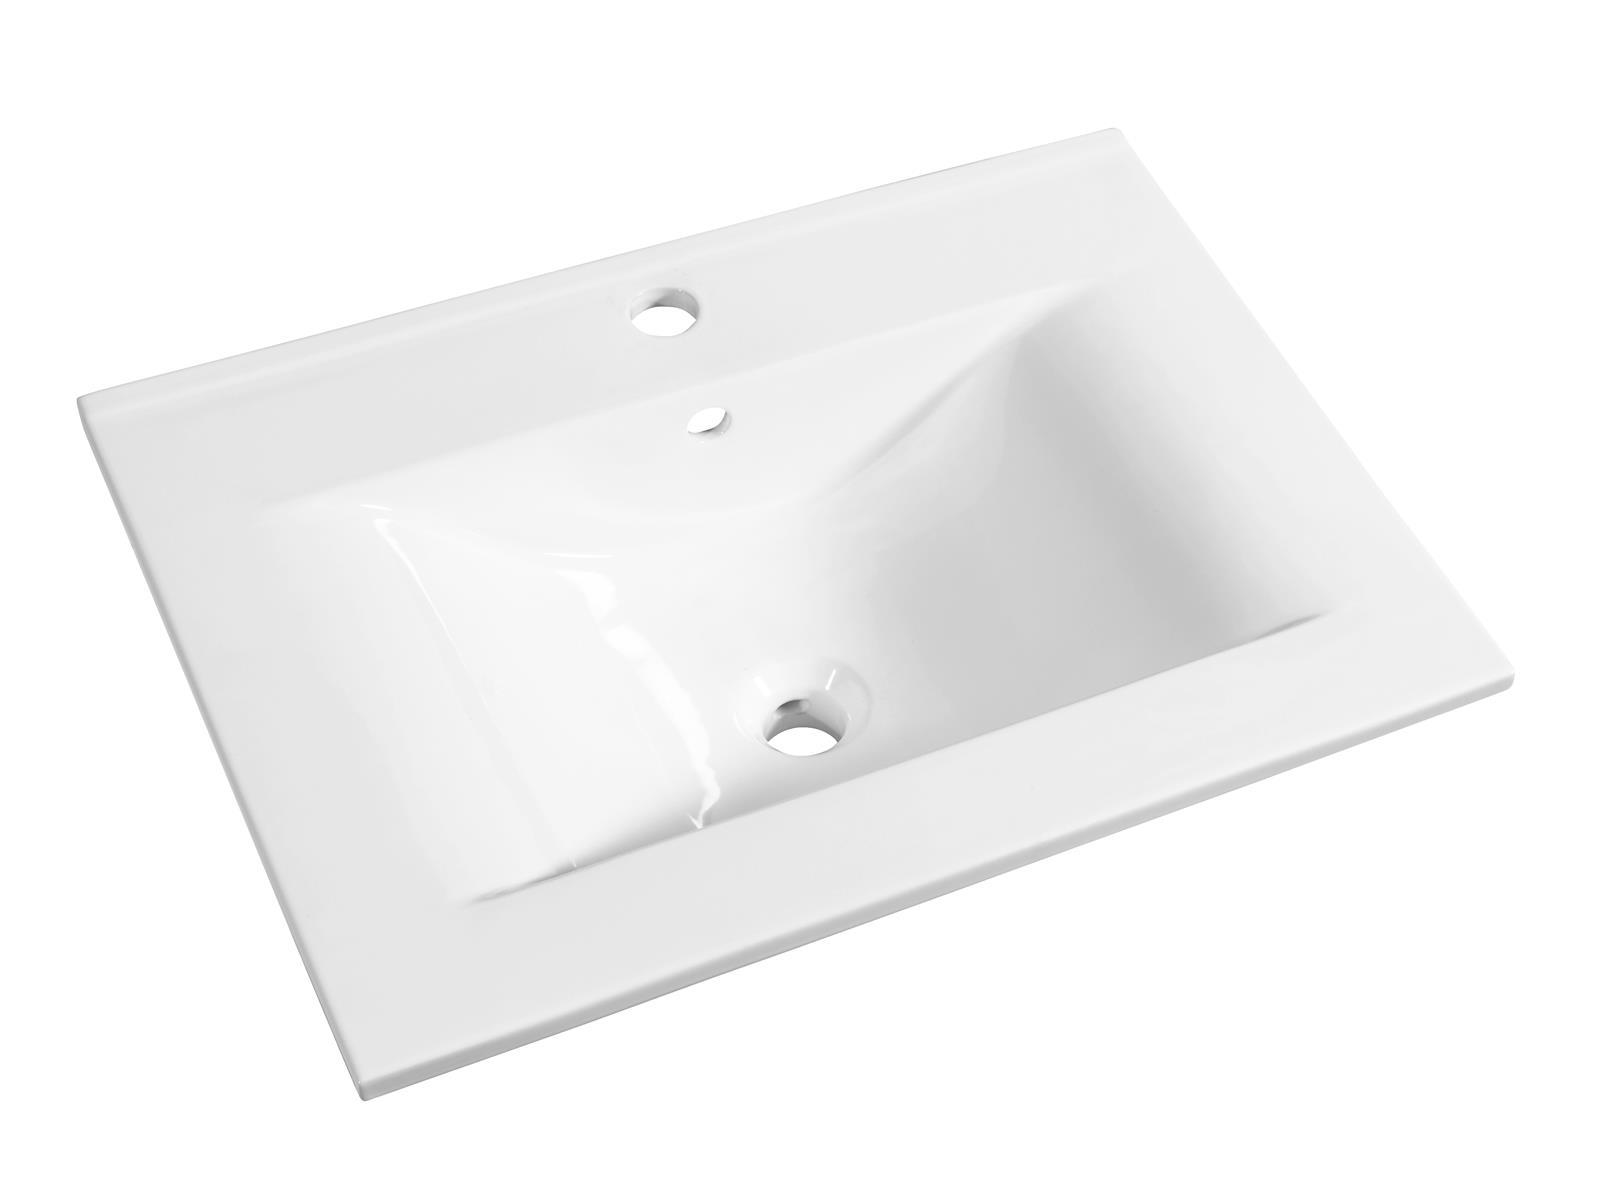 plan cramique soft srie adesio 3 sanitaire distribution. Black Bedroom Furniture Sets. Home Design Ideas